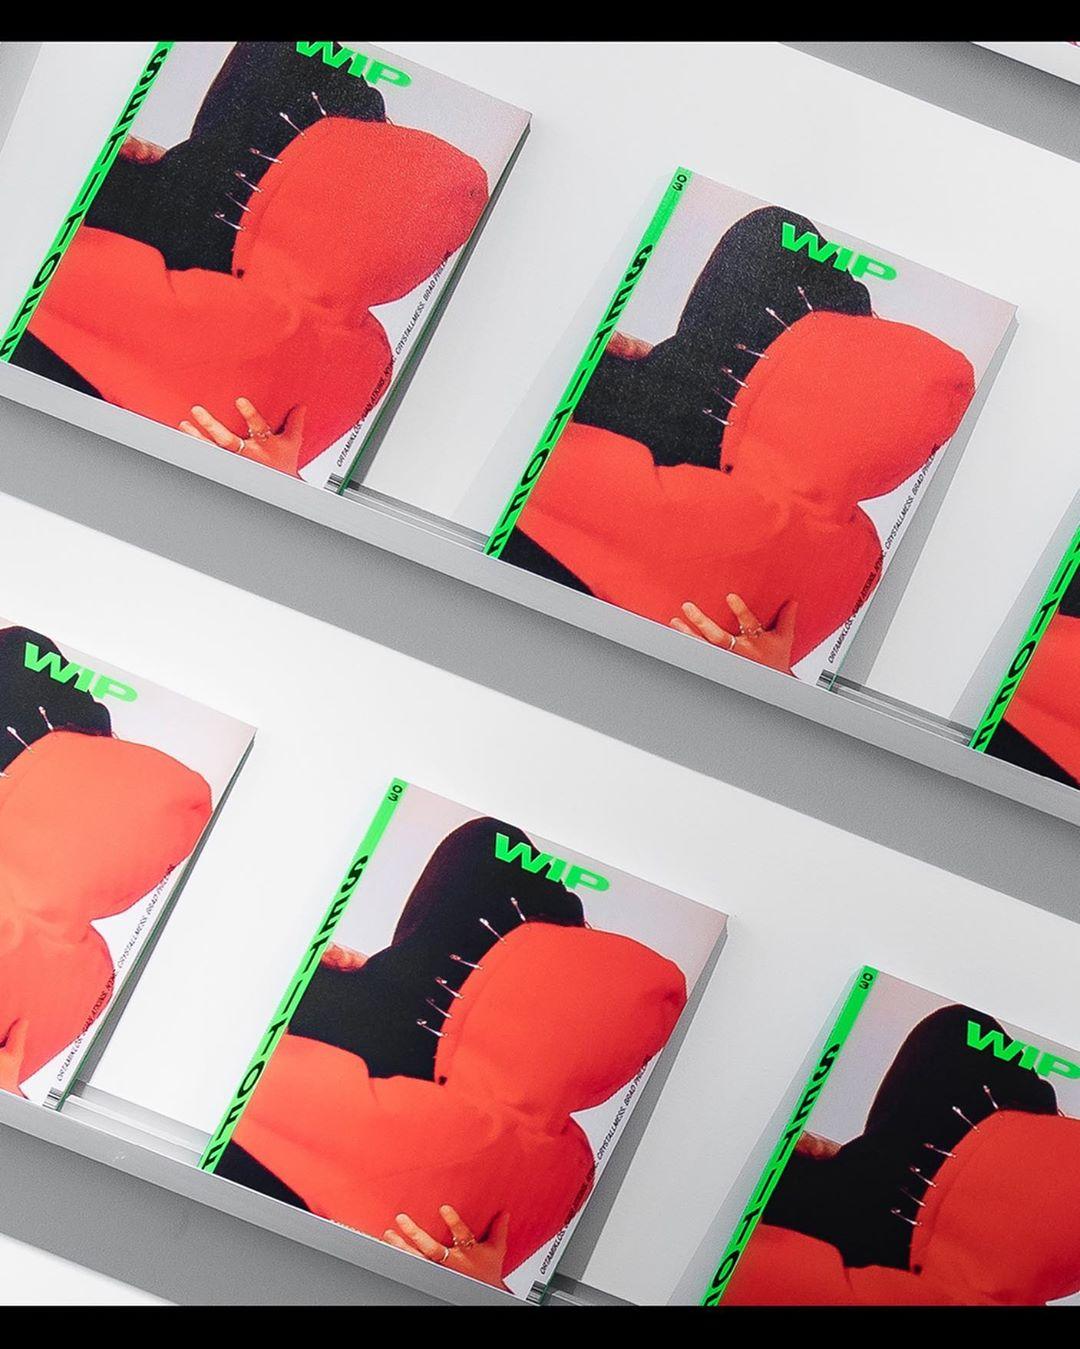 Carhartt Wip issue 3, launch exhibition w/ @carharttwip @oddityparis #2019